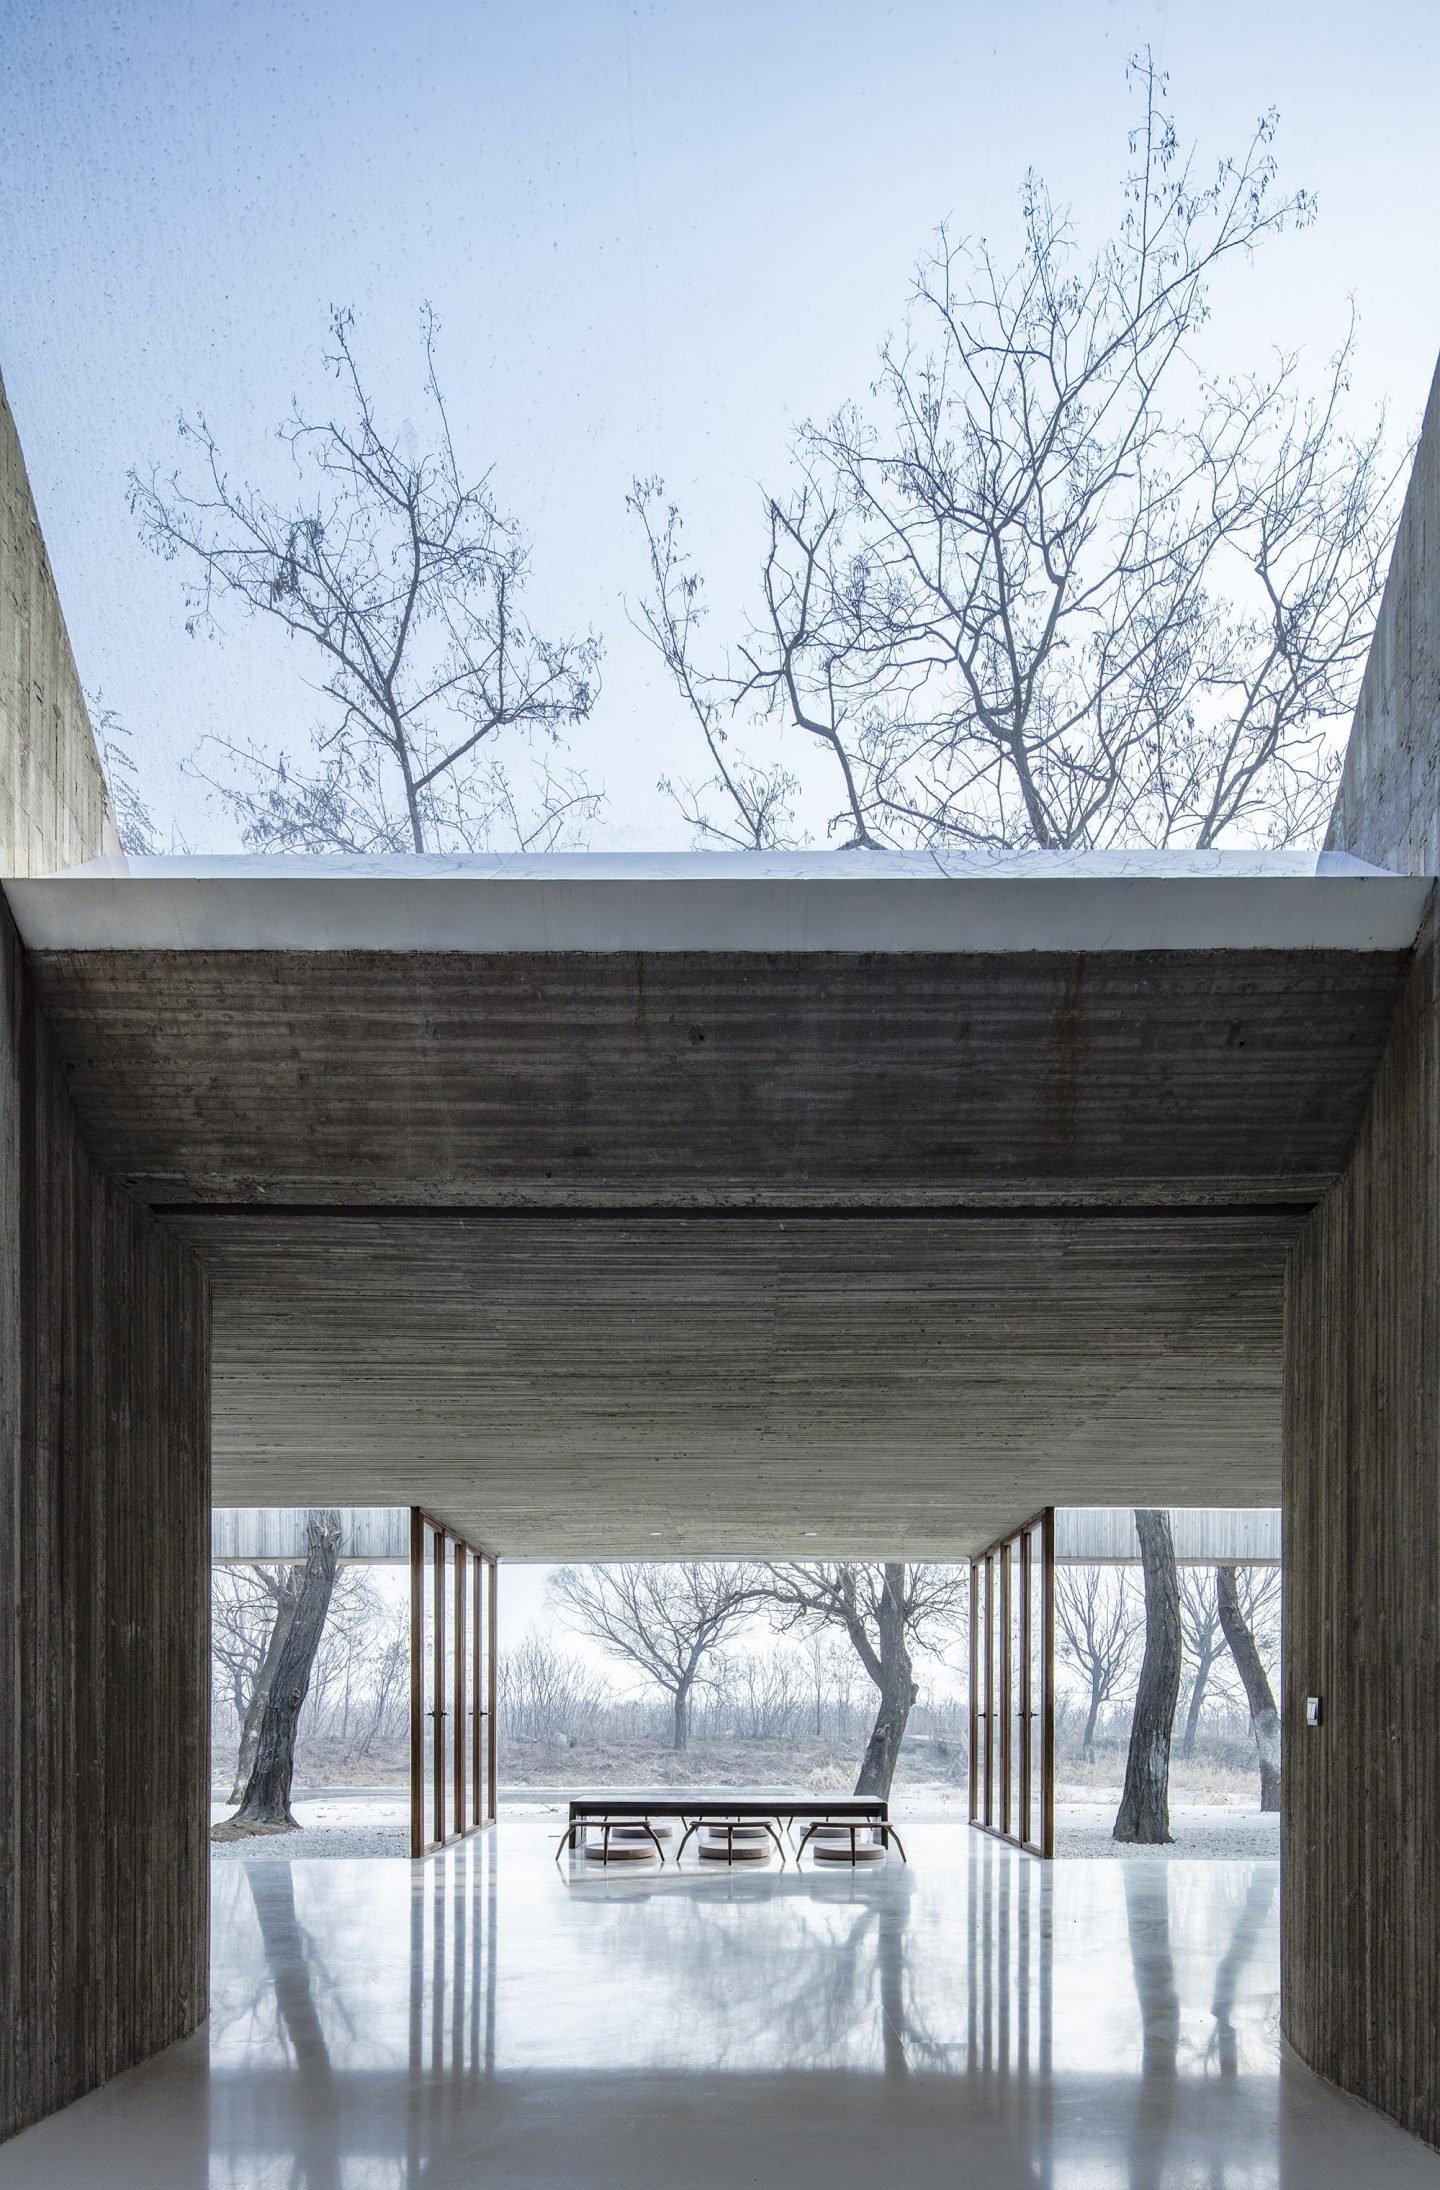 IGNANT-Architecture-Archstudio-Waterside-Buddhist-Shrine-02-min